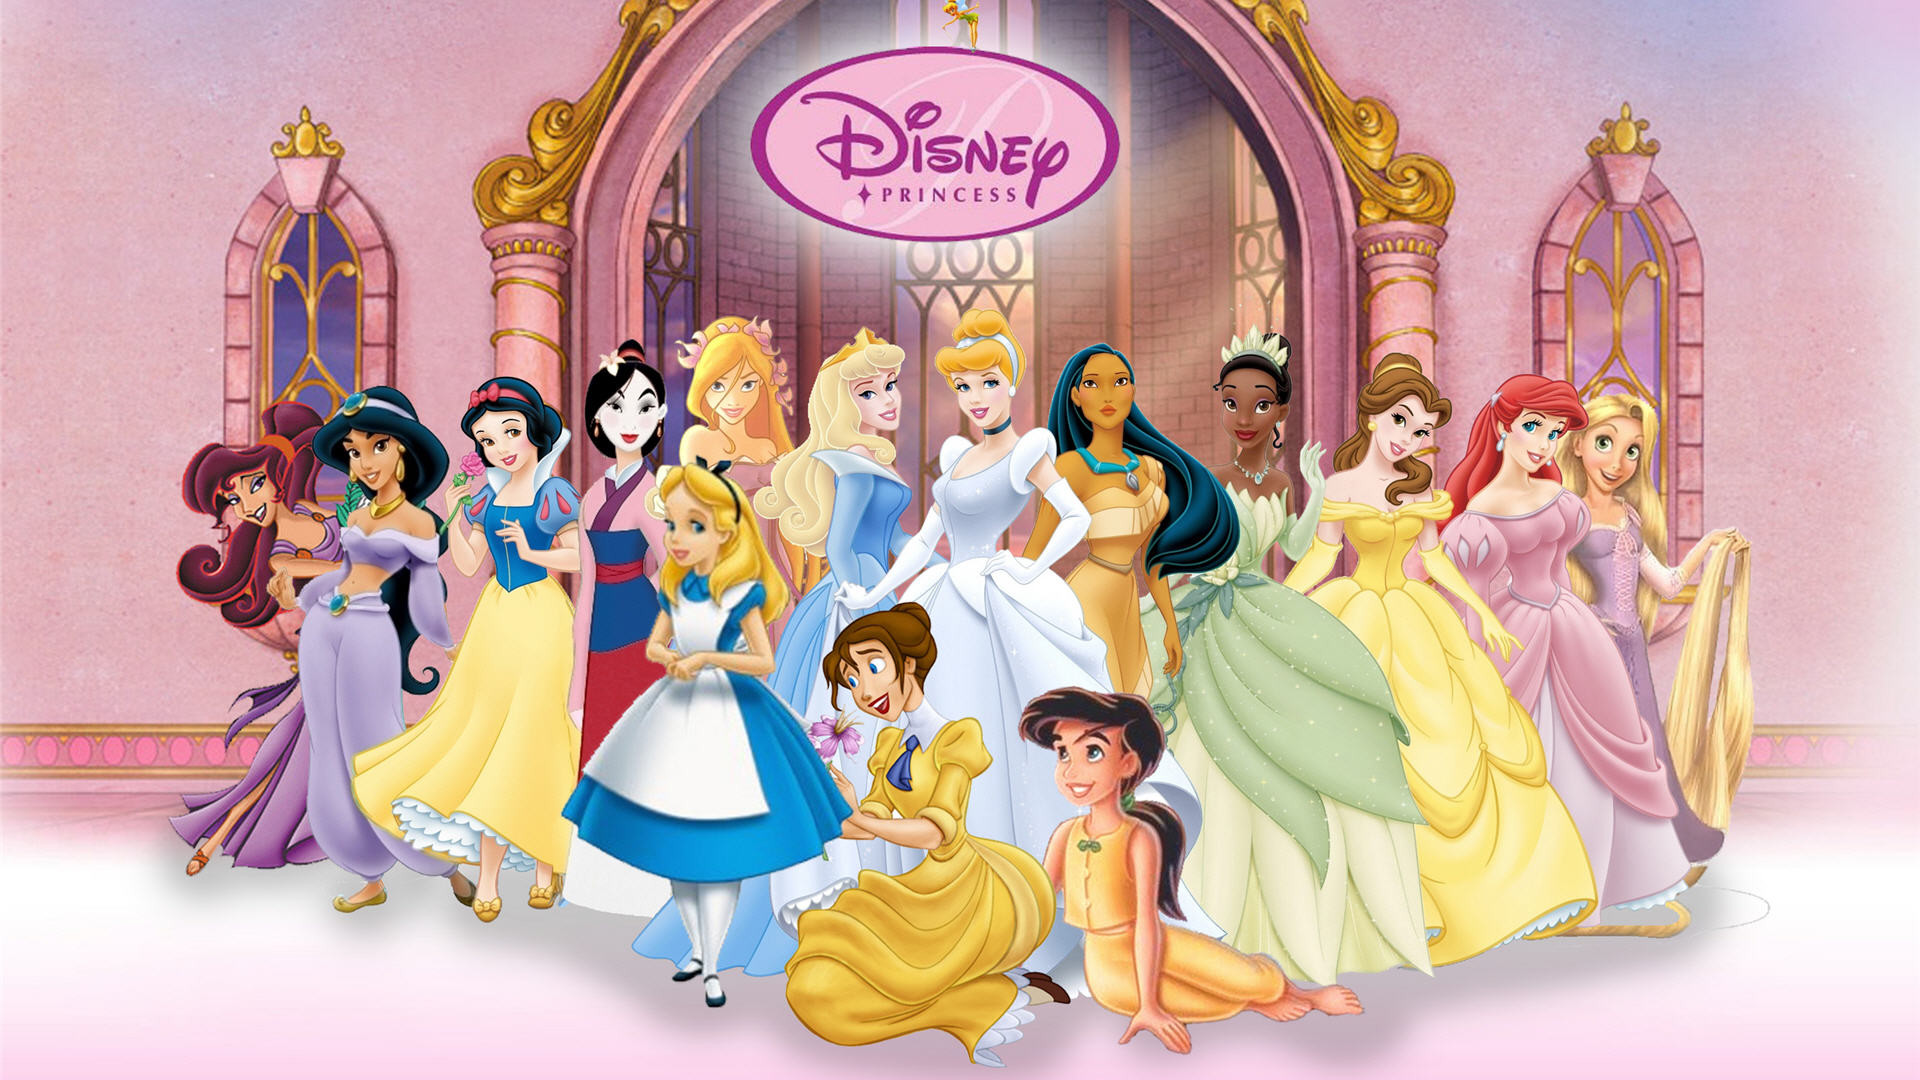 Disney Princess High Quality Wallpaper